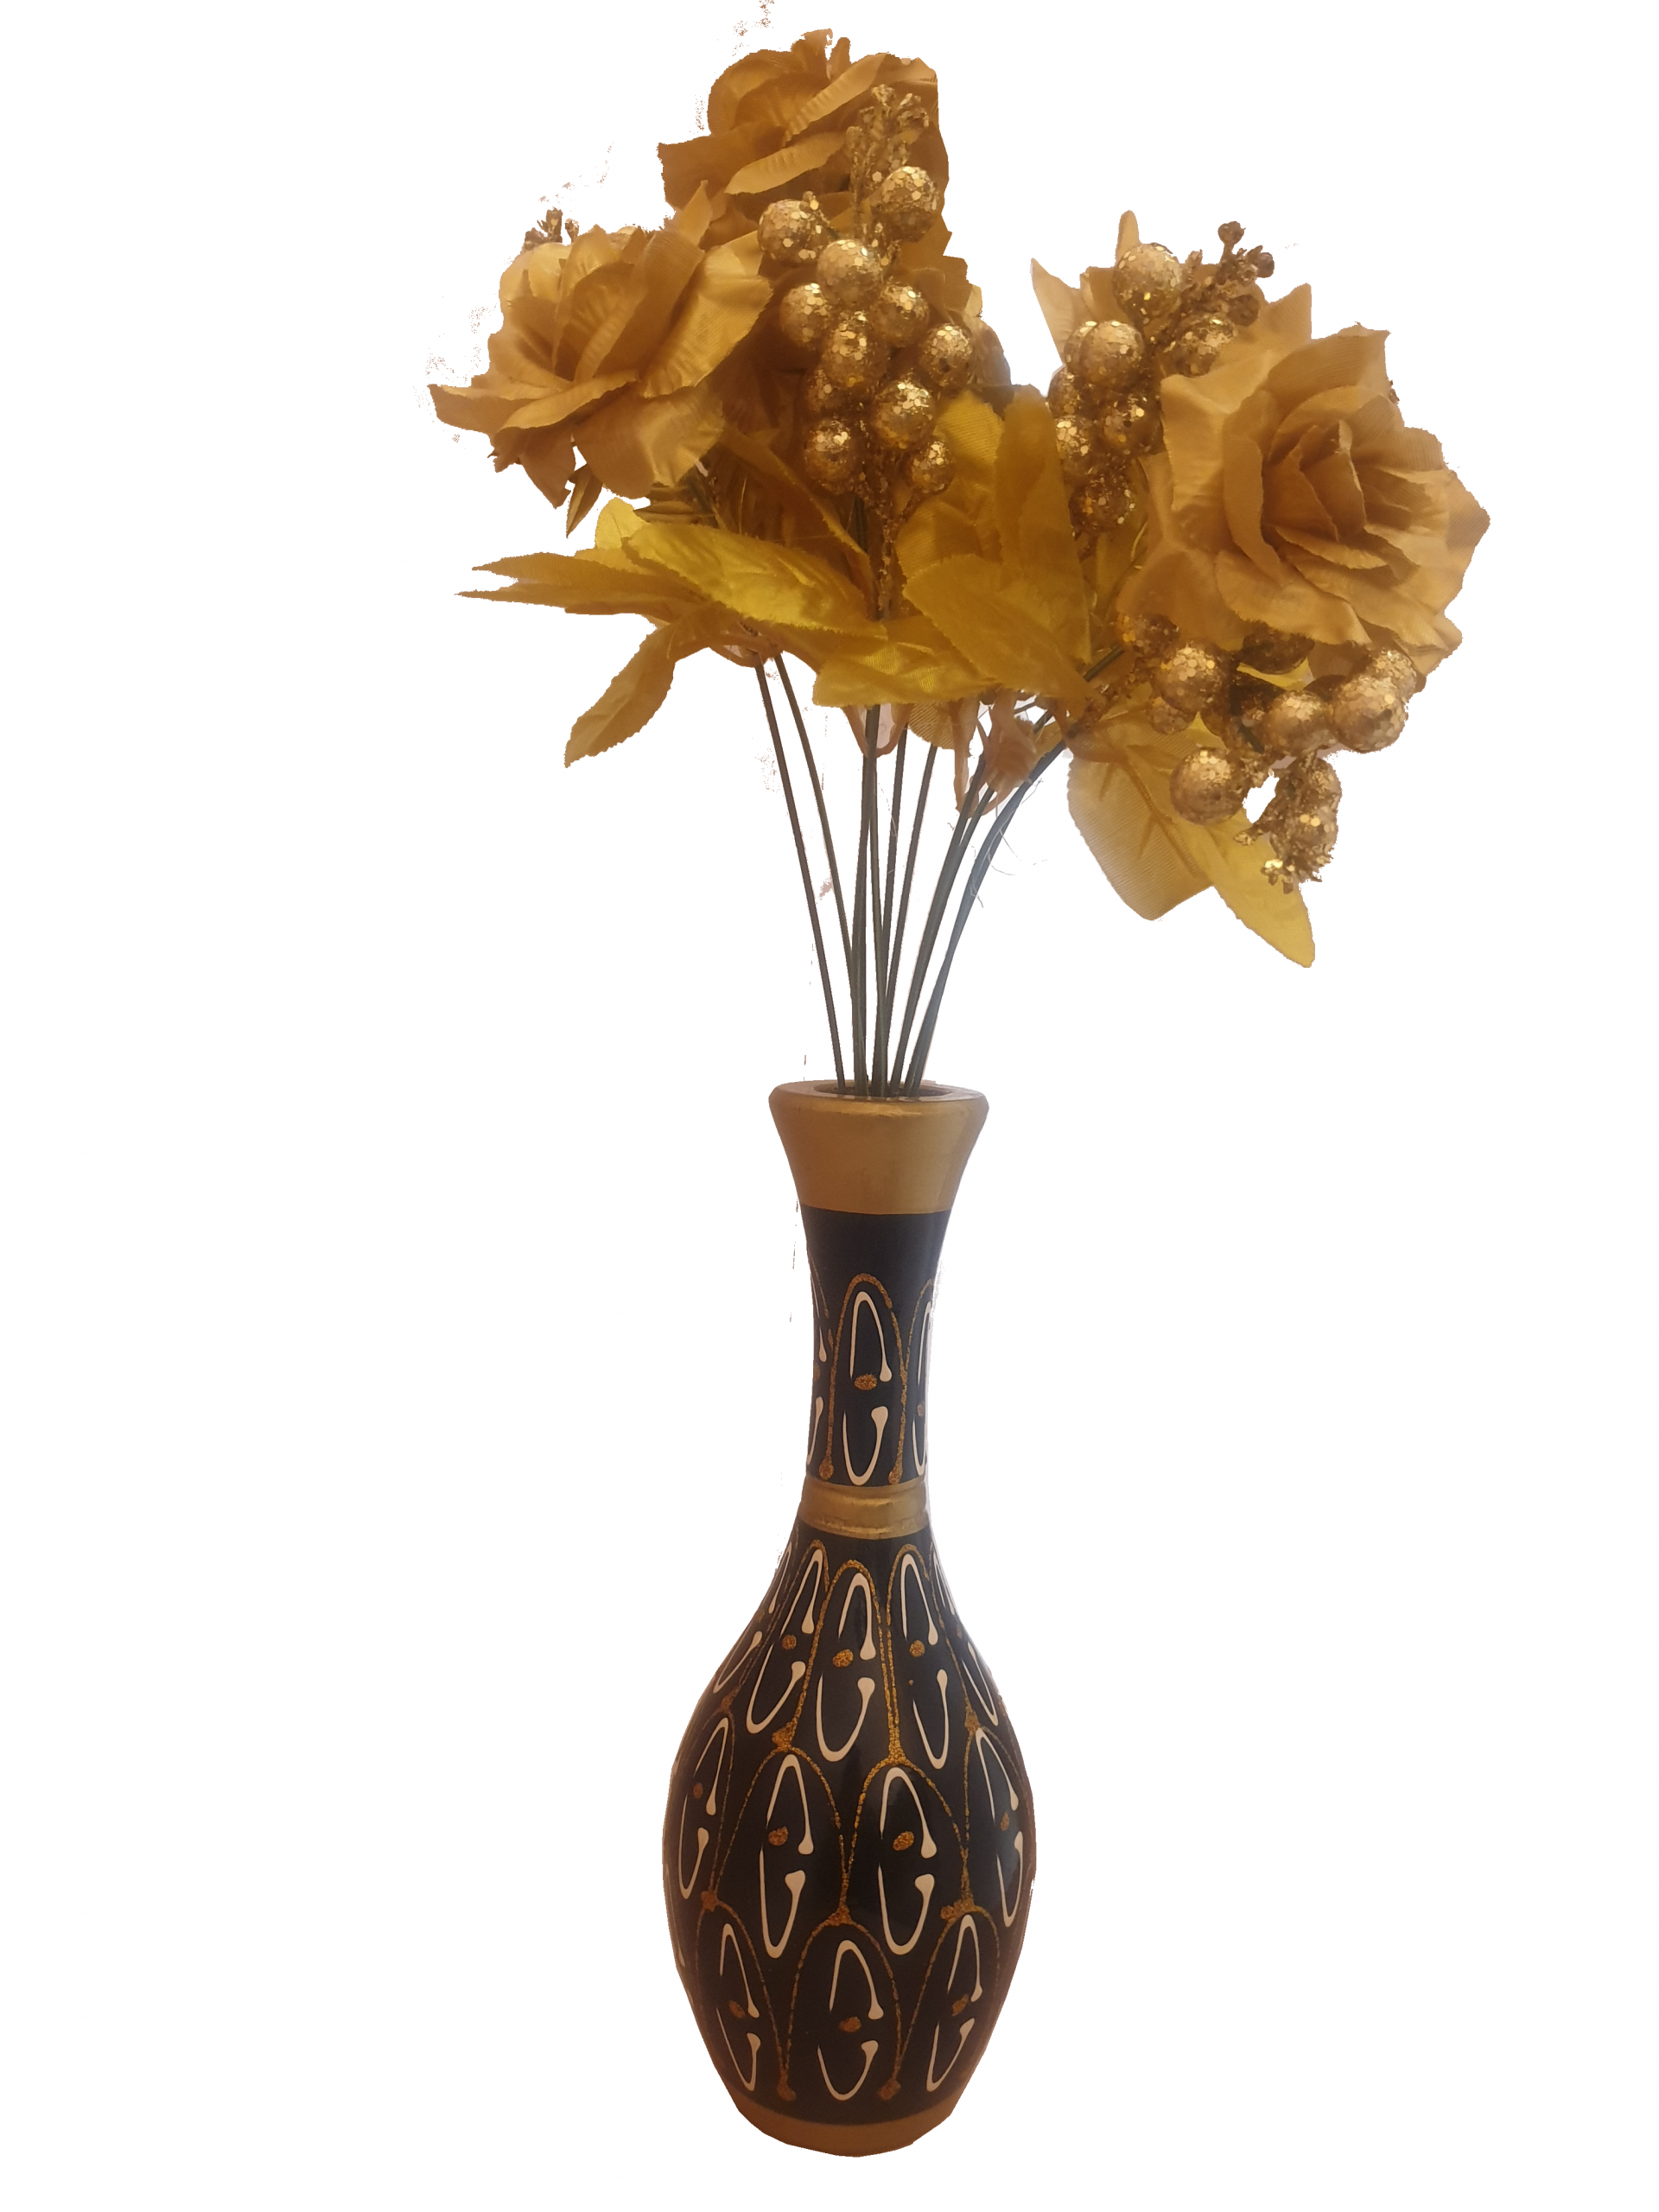 Carved Wooden Flower Vase intended for size 3024 X 4032